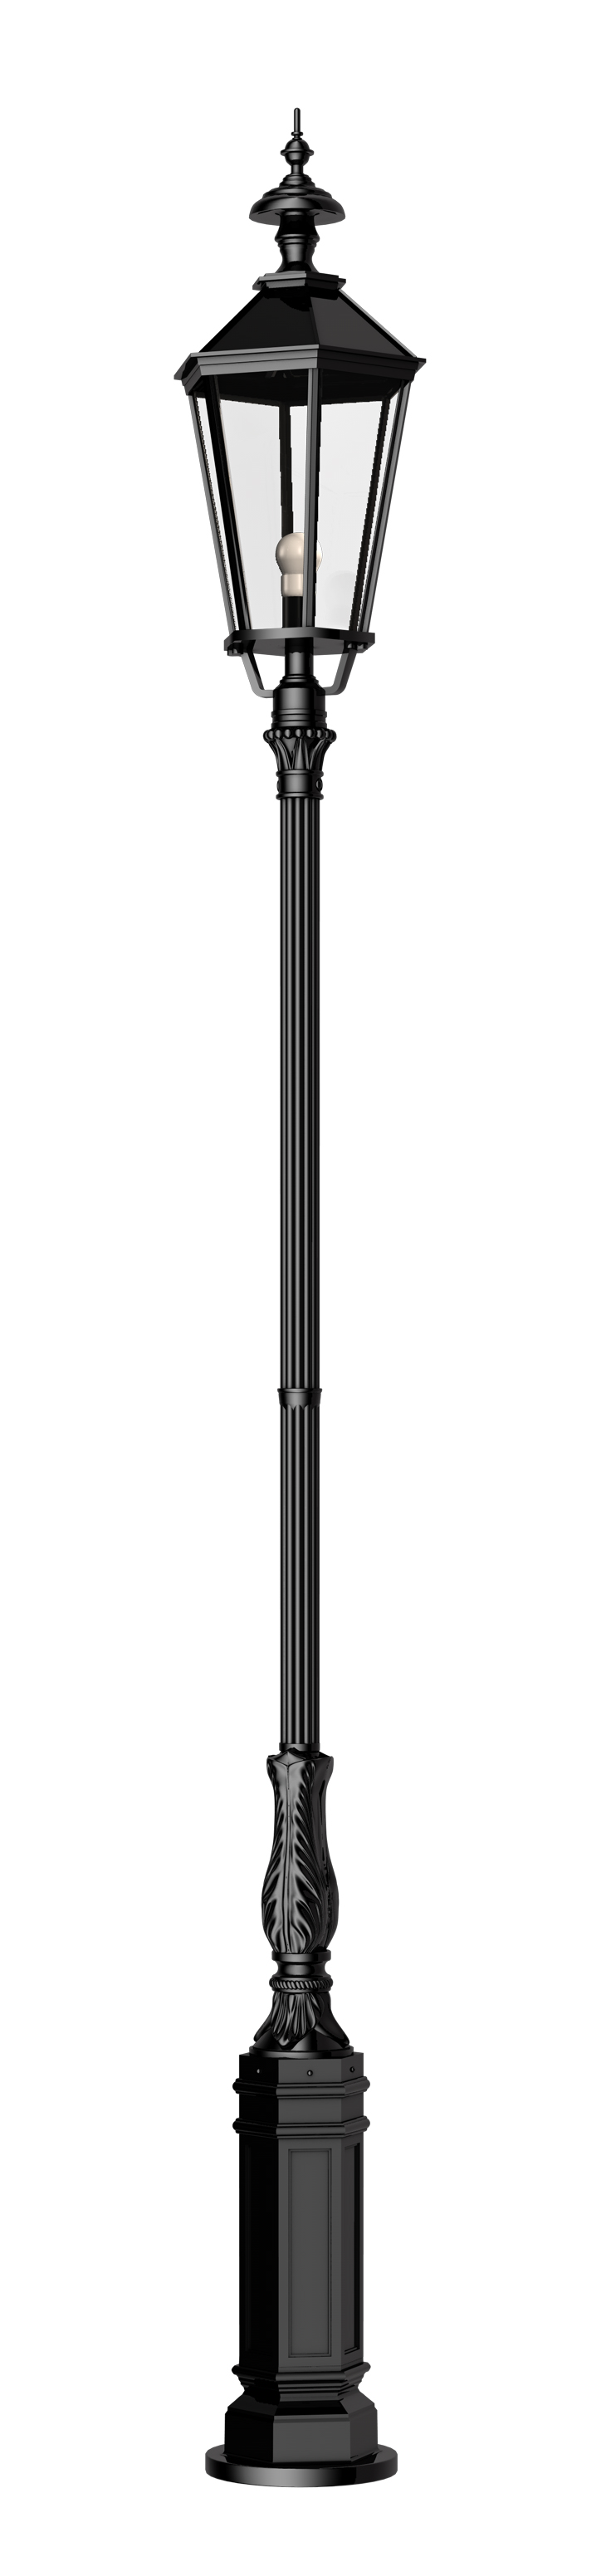 70-1823-361